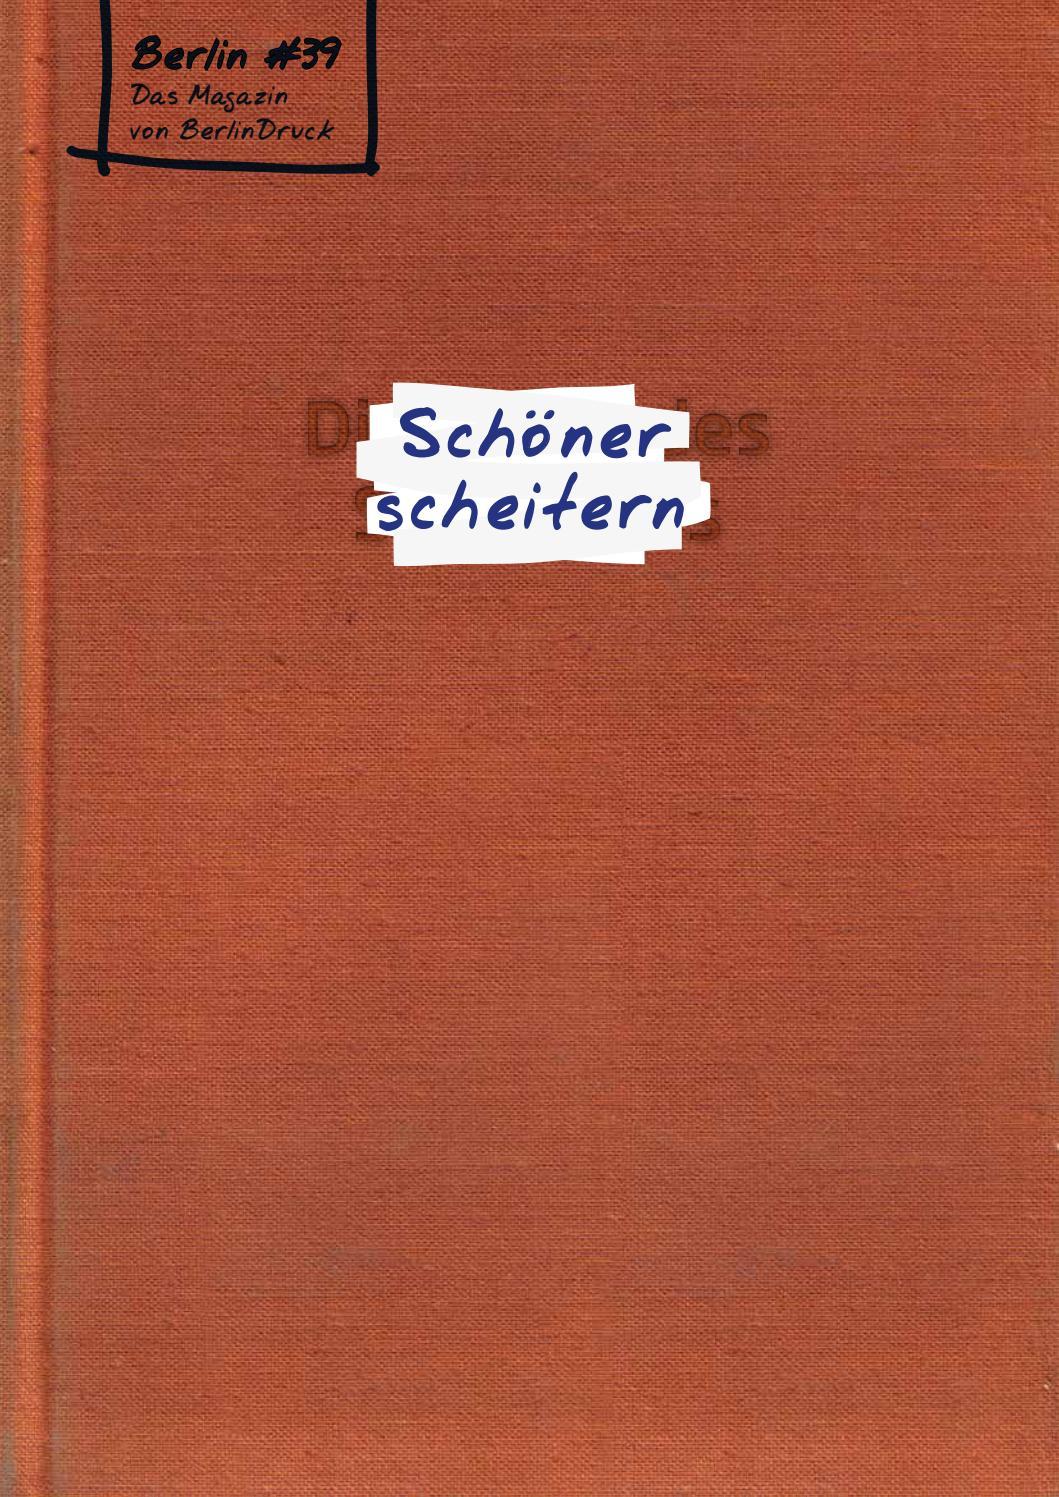 Kundenmagazin BerlinDruck #39 by Reinhard Berlin - issuu